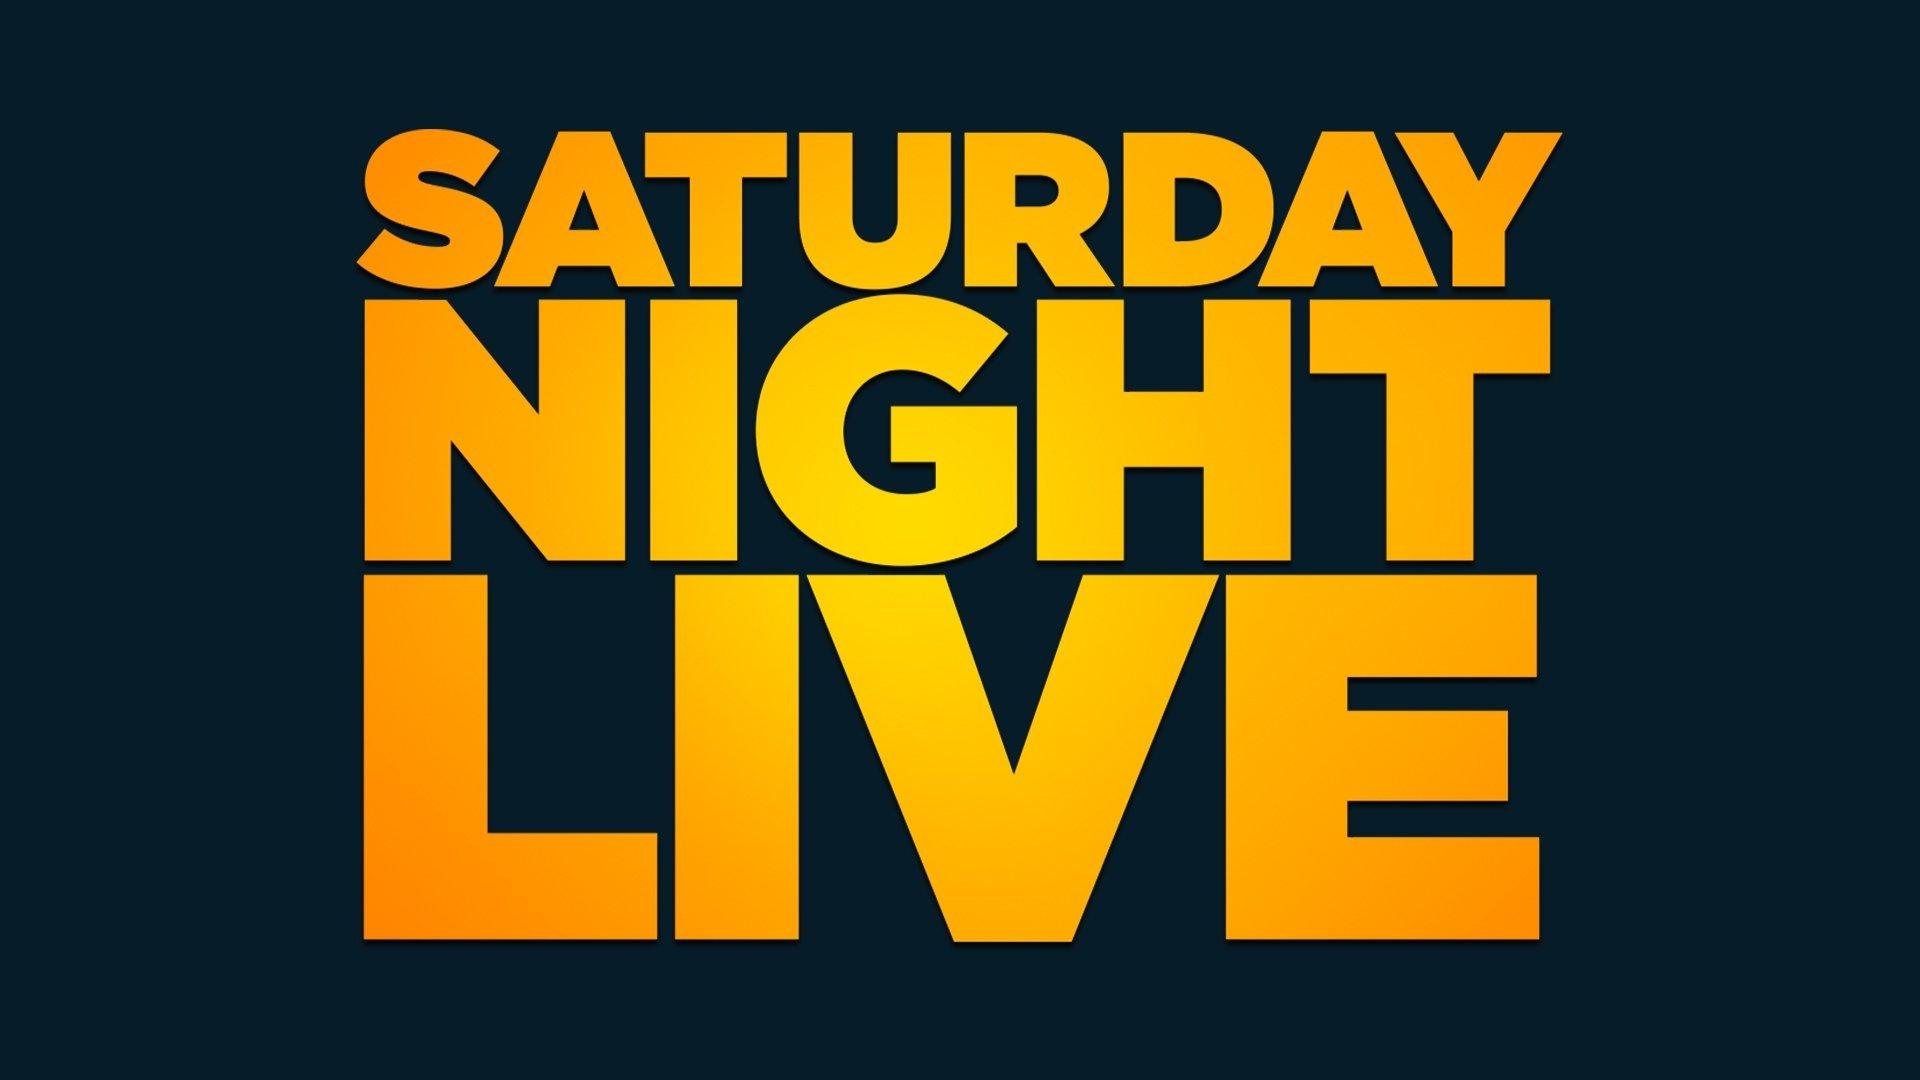 Saturday Night Live HD Wallpaper Background Image 1920x1080 1920x1080